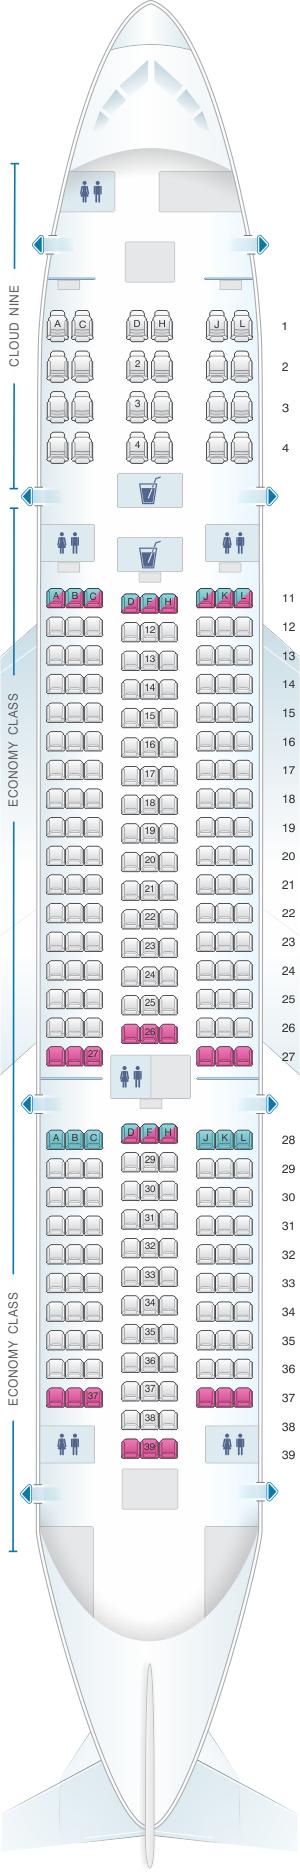 Seat map for Ethiopian Boeing B787 8